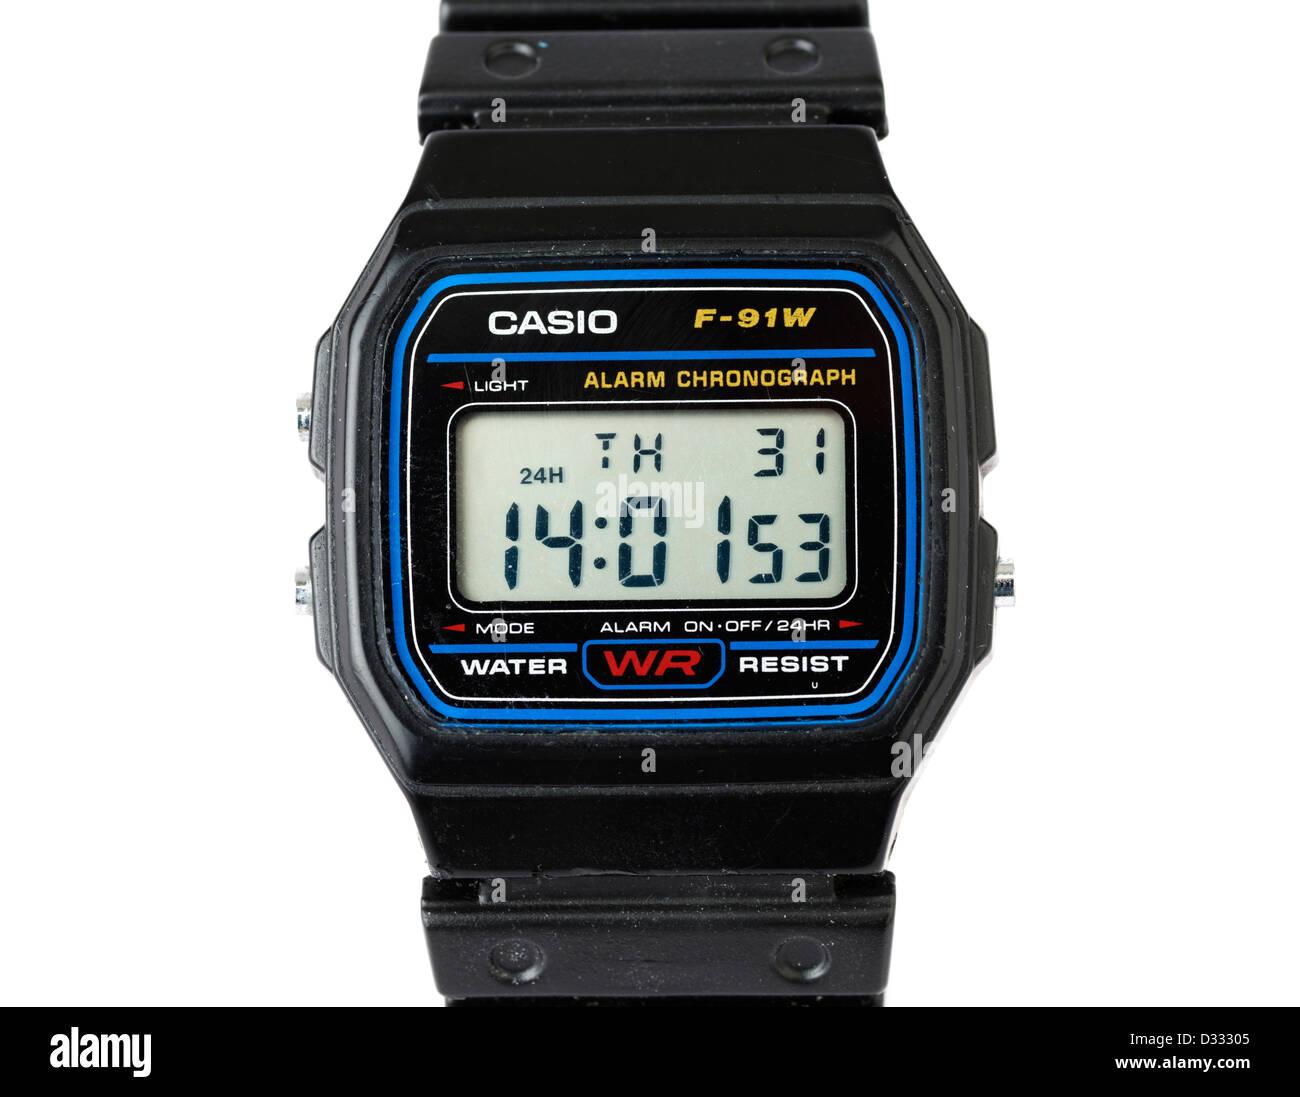 Reloj digital Casio Imagen De Stock